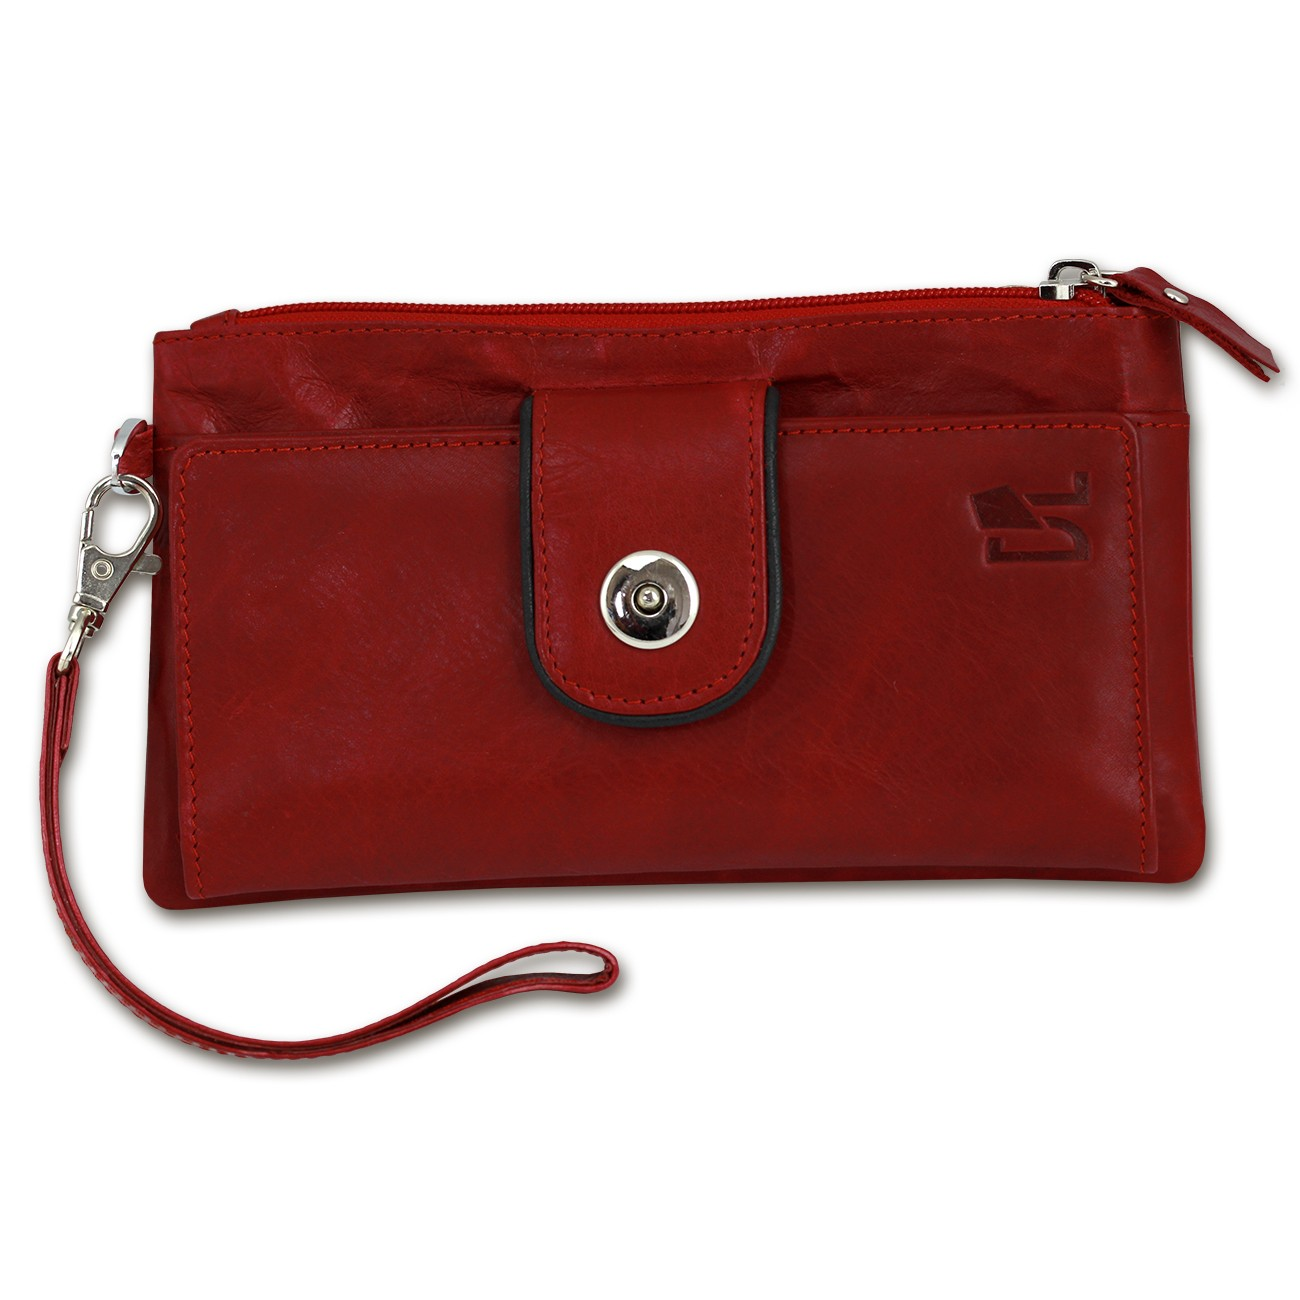 Geldbörse Handyhülle Clutch Leder rot Wristlet 3in1 DrachenLeder OTZ500R